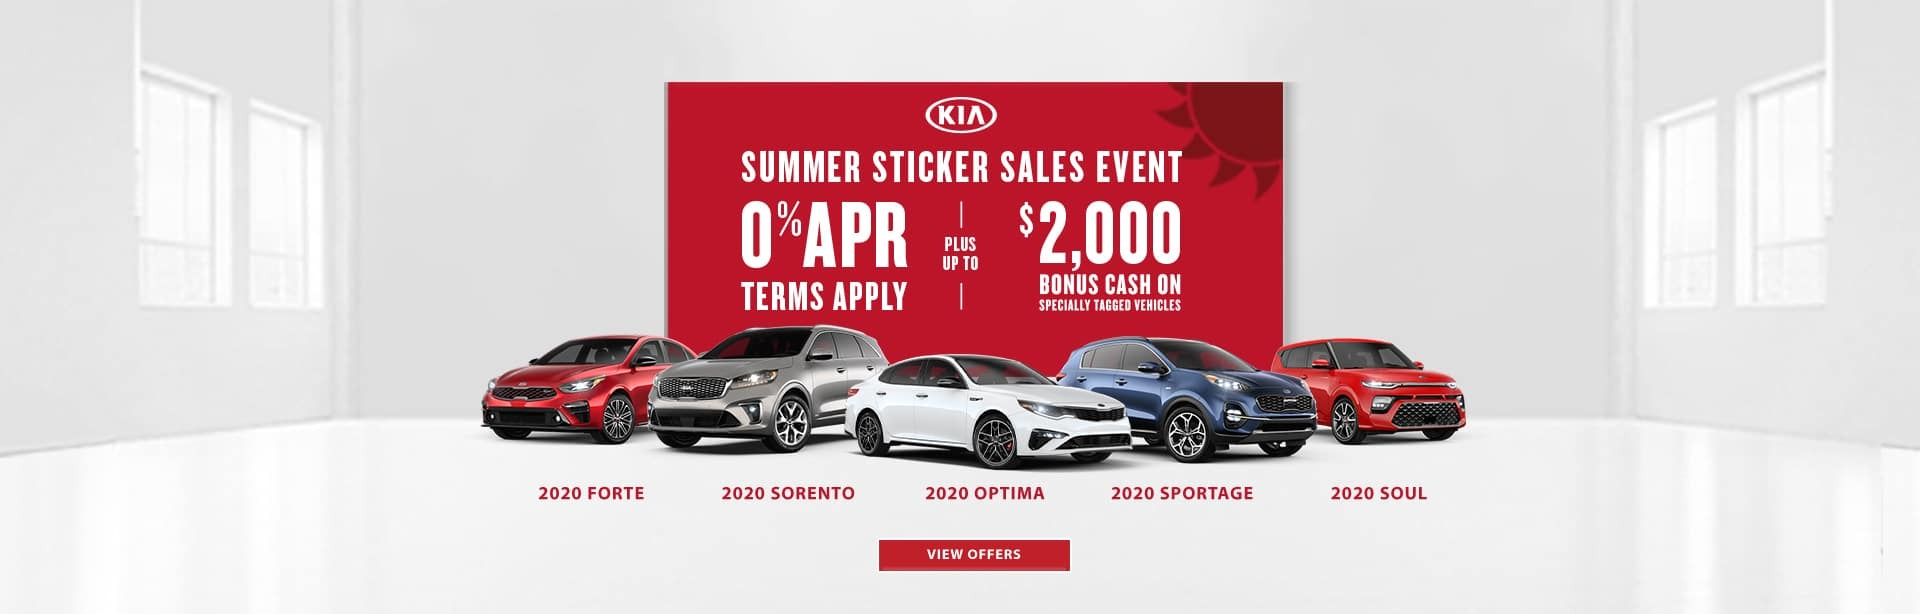 Kia Dealership Fort Worth TX Used Cars Moritz Kia Dealerships